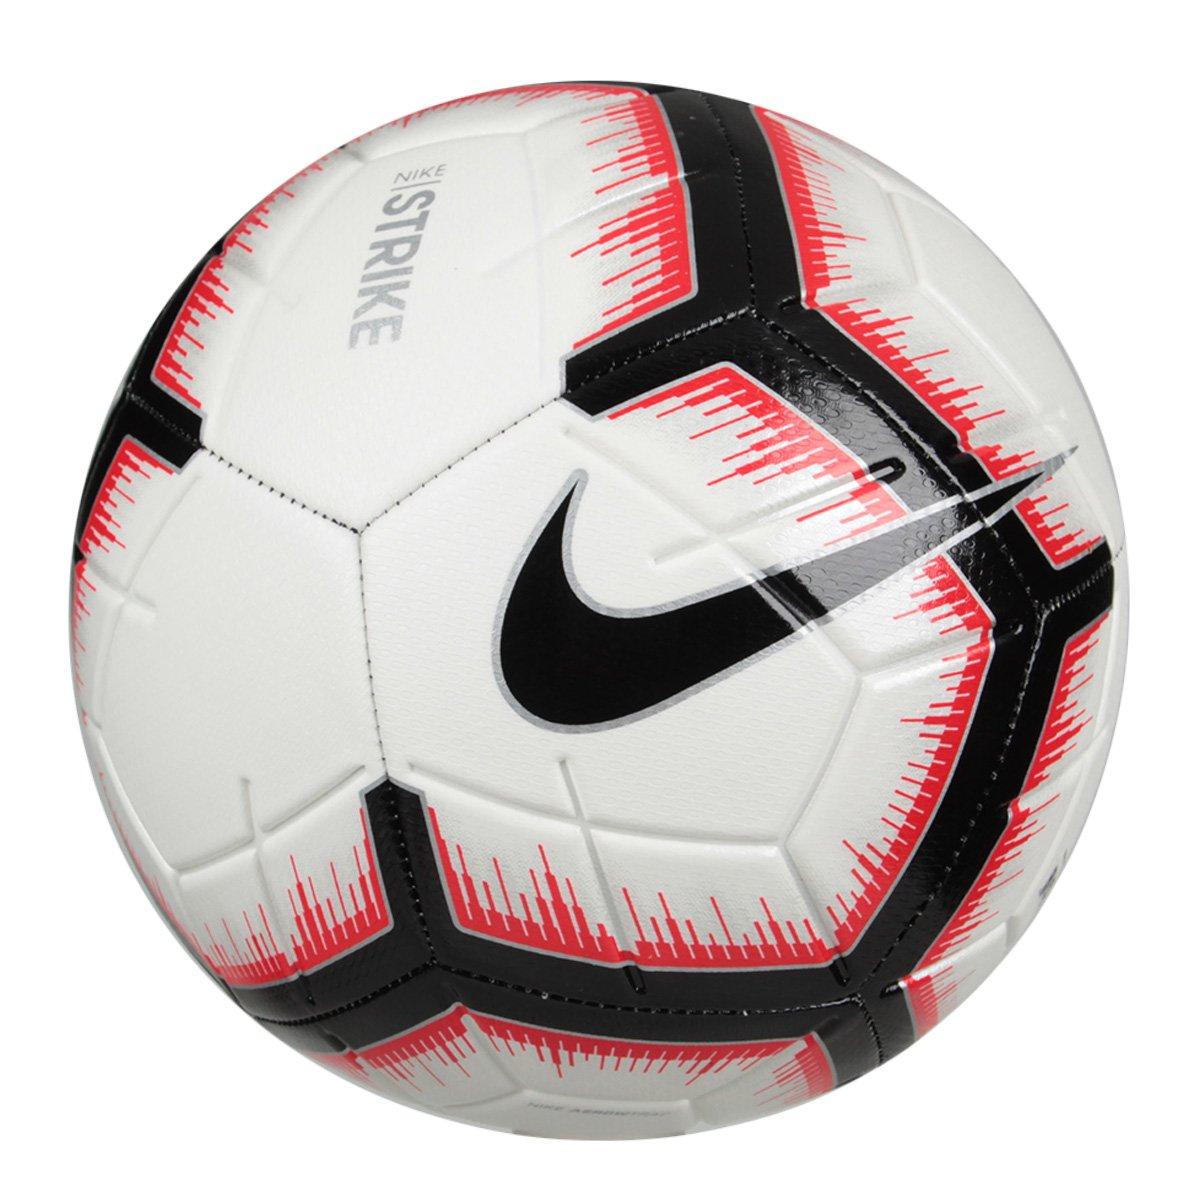 9a9ee4b722 Bola de Futebol Campo Strike Nike